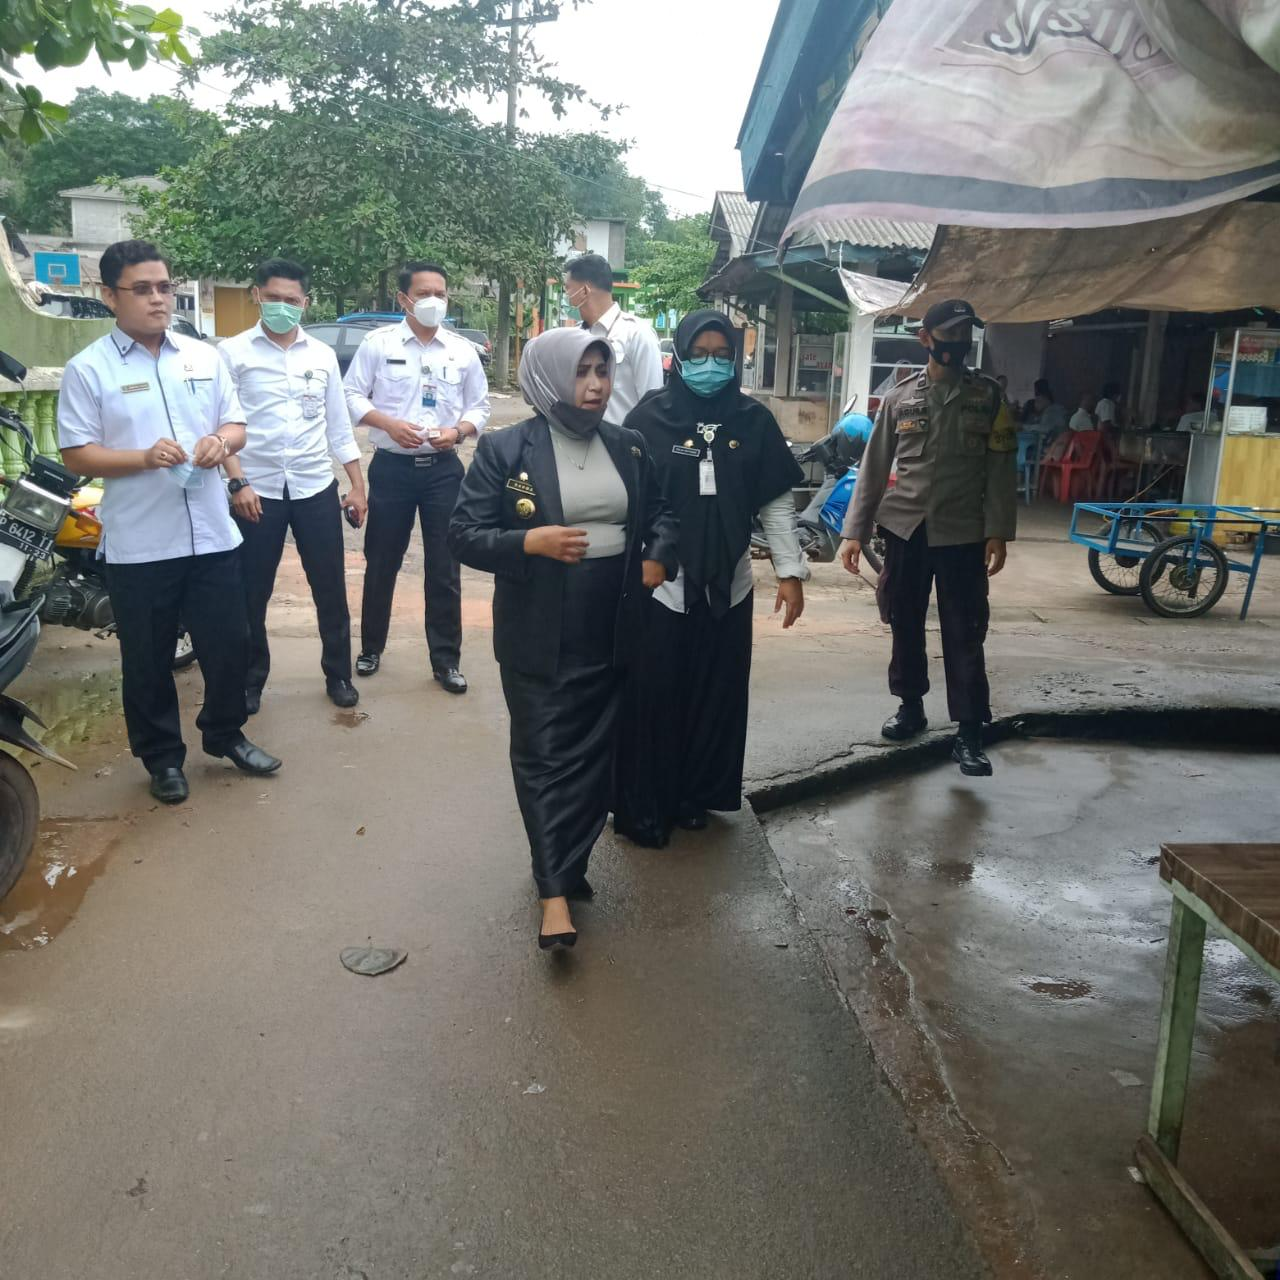 Banjir Rob Akibat Air Laut Pasang, Walikota Langsung Temui Warga Senggarang